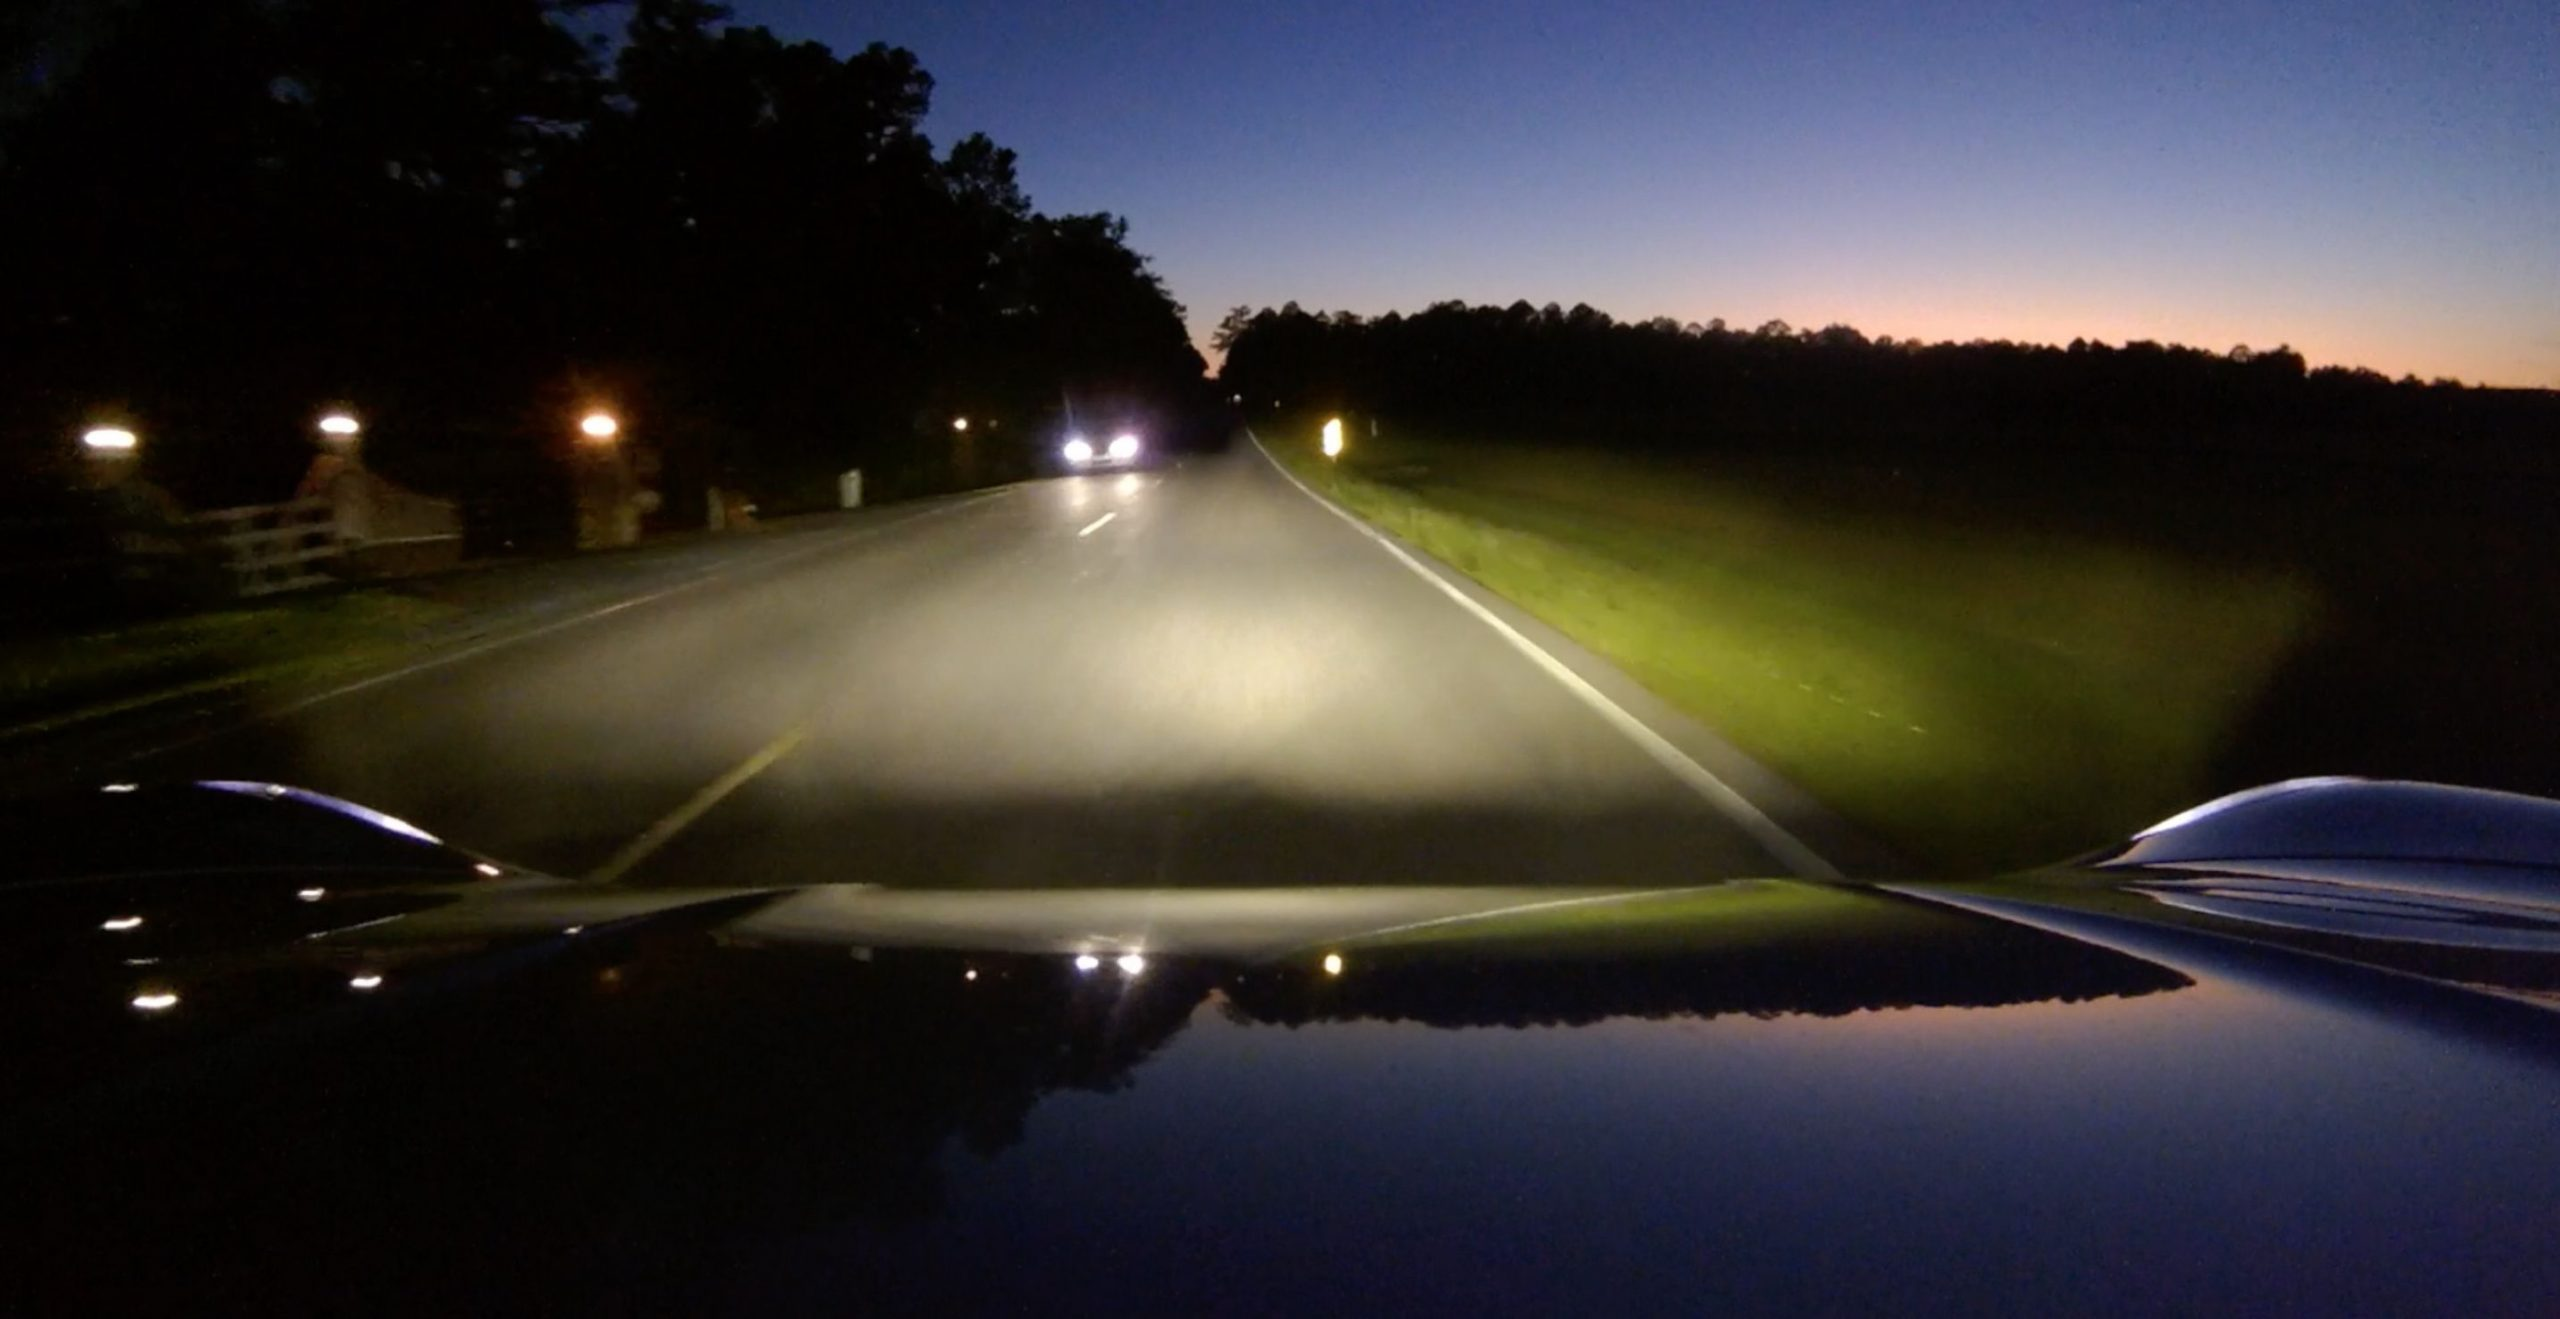 How to Clean Foggy Headlight Lenses